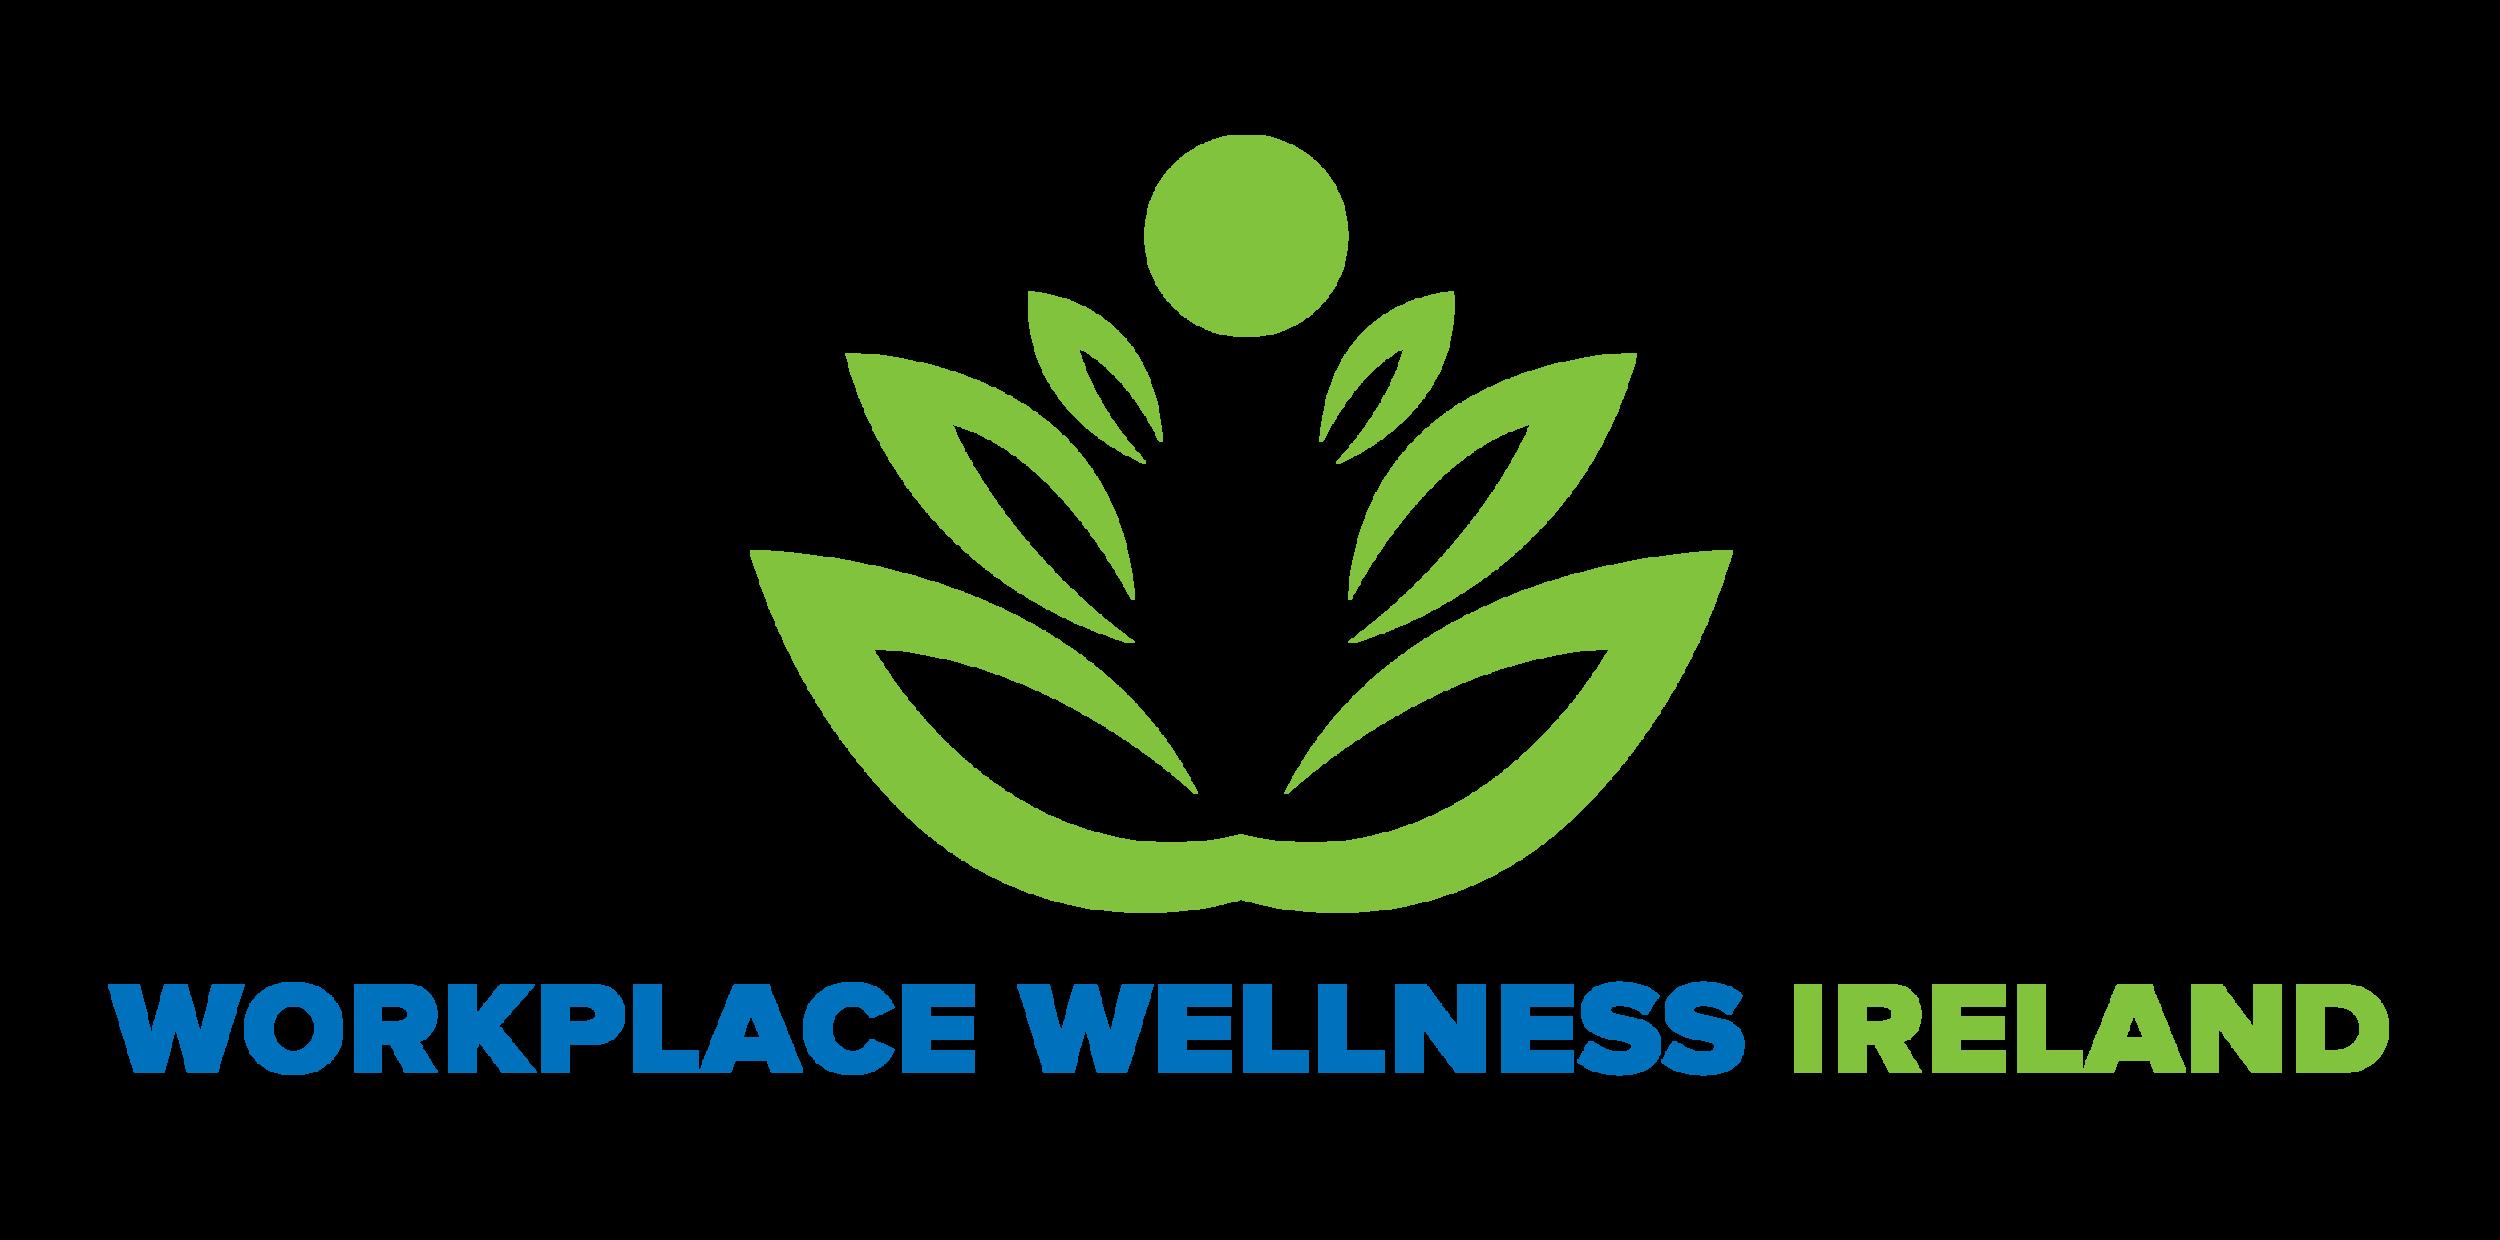 workplace wellness ireland